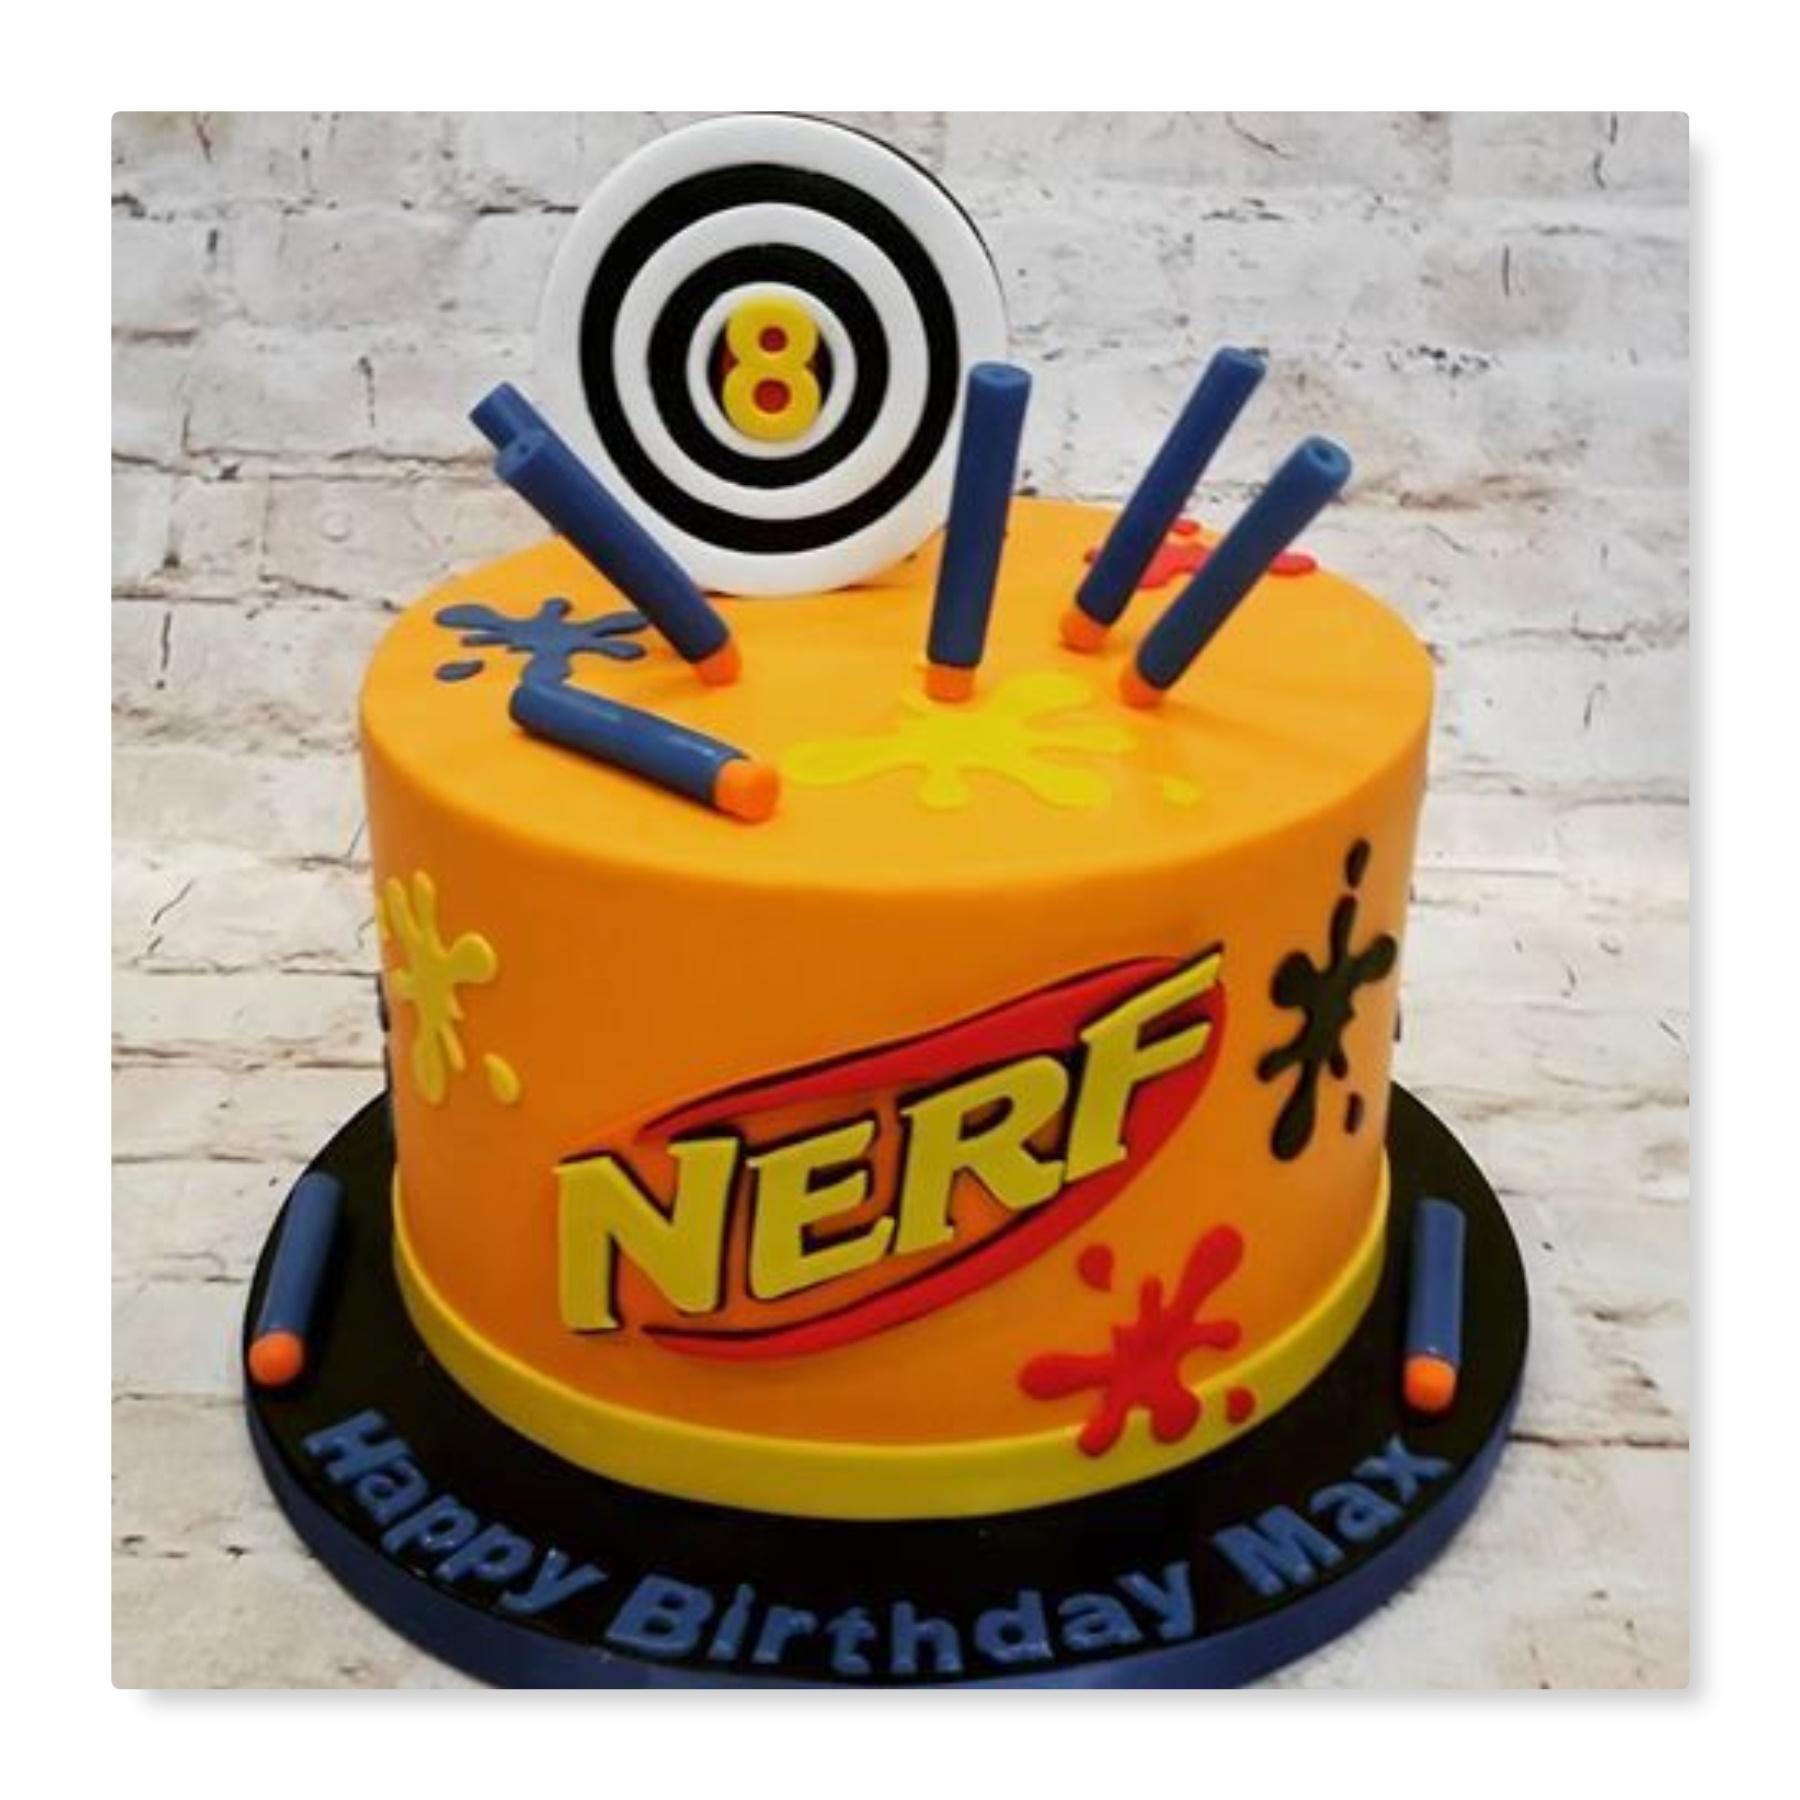 nerf wars birthday party cake